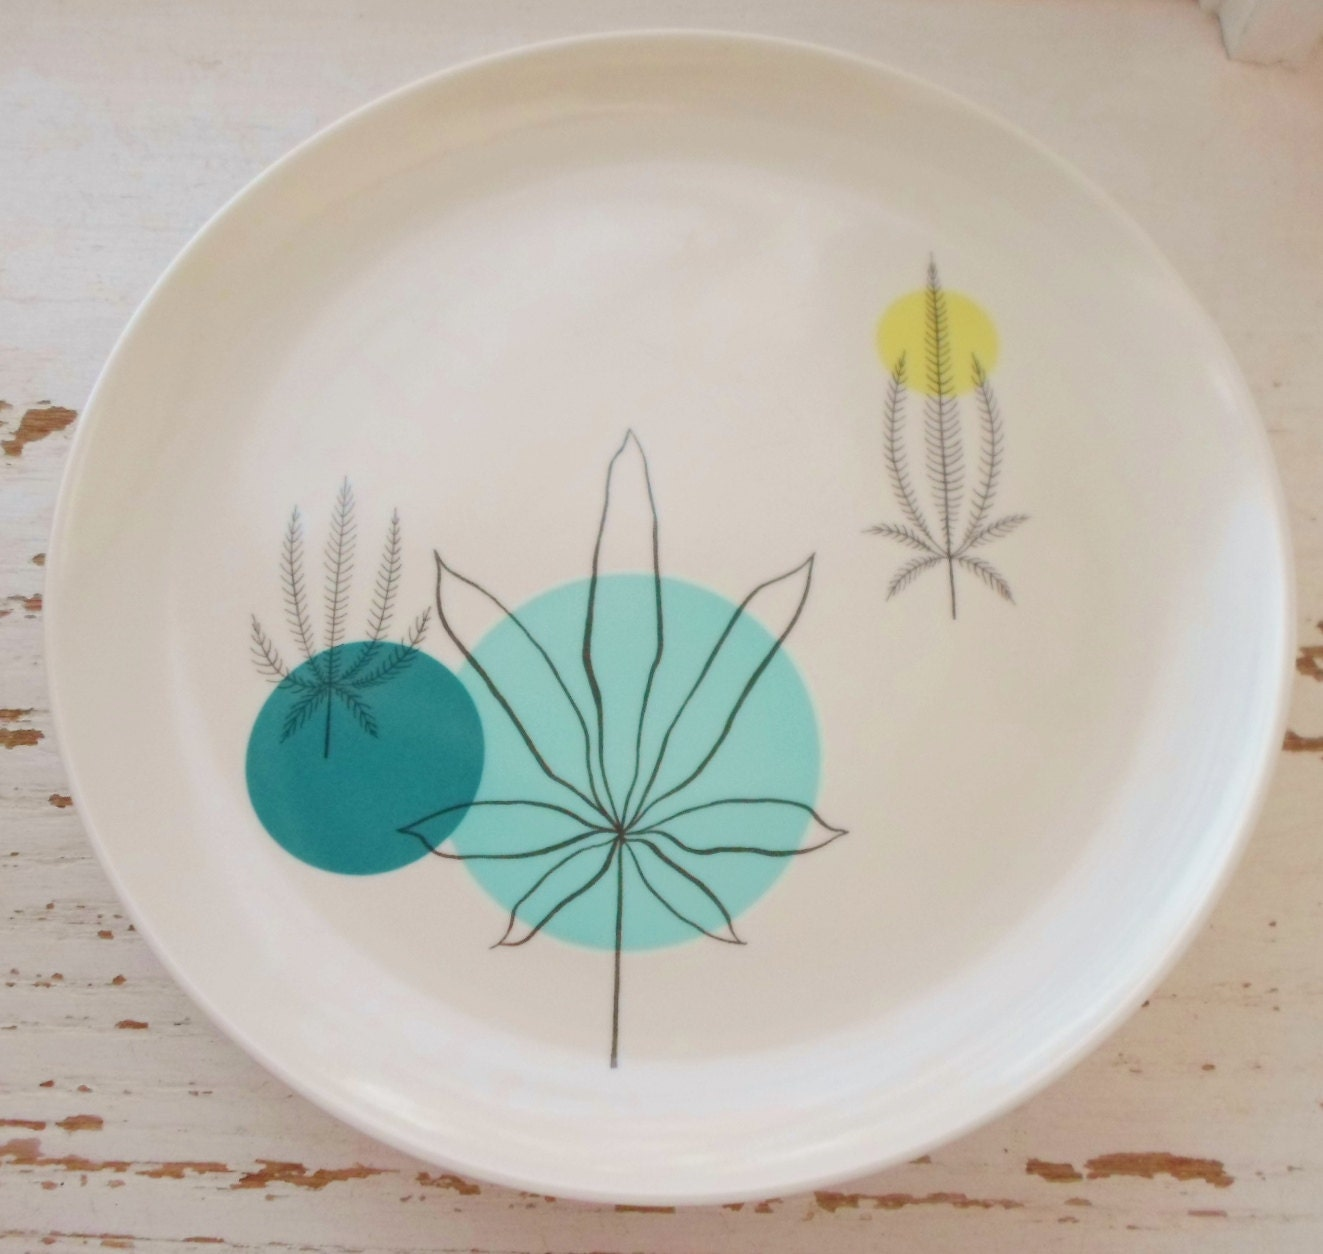 Rare Vintage Brookpark Fantasy Melmac Dinner Plates Turquoise